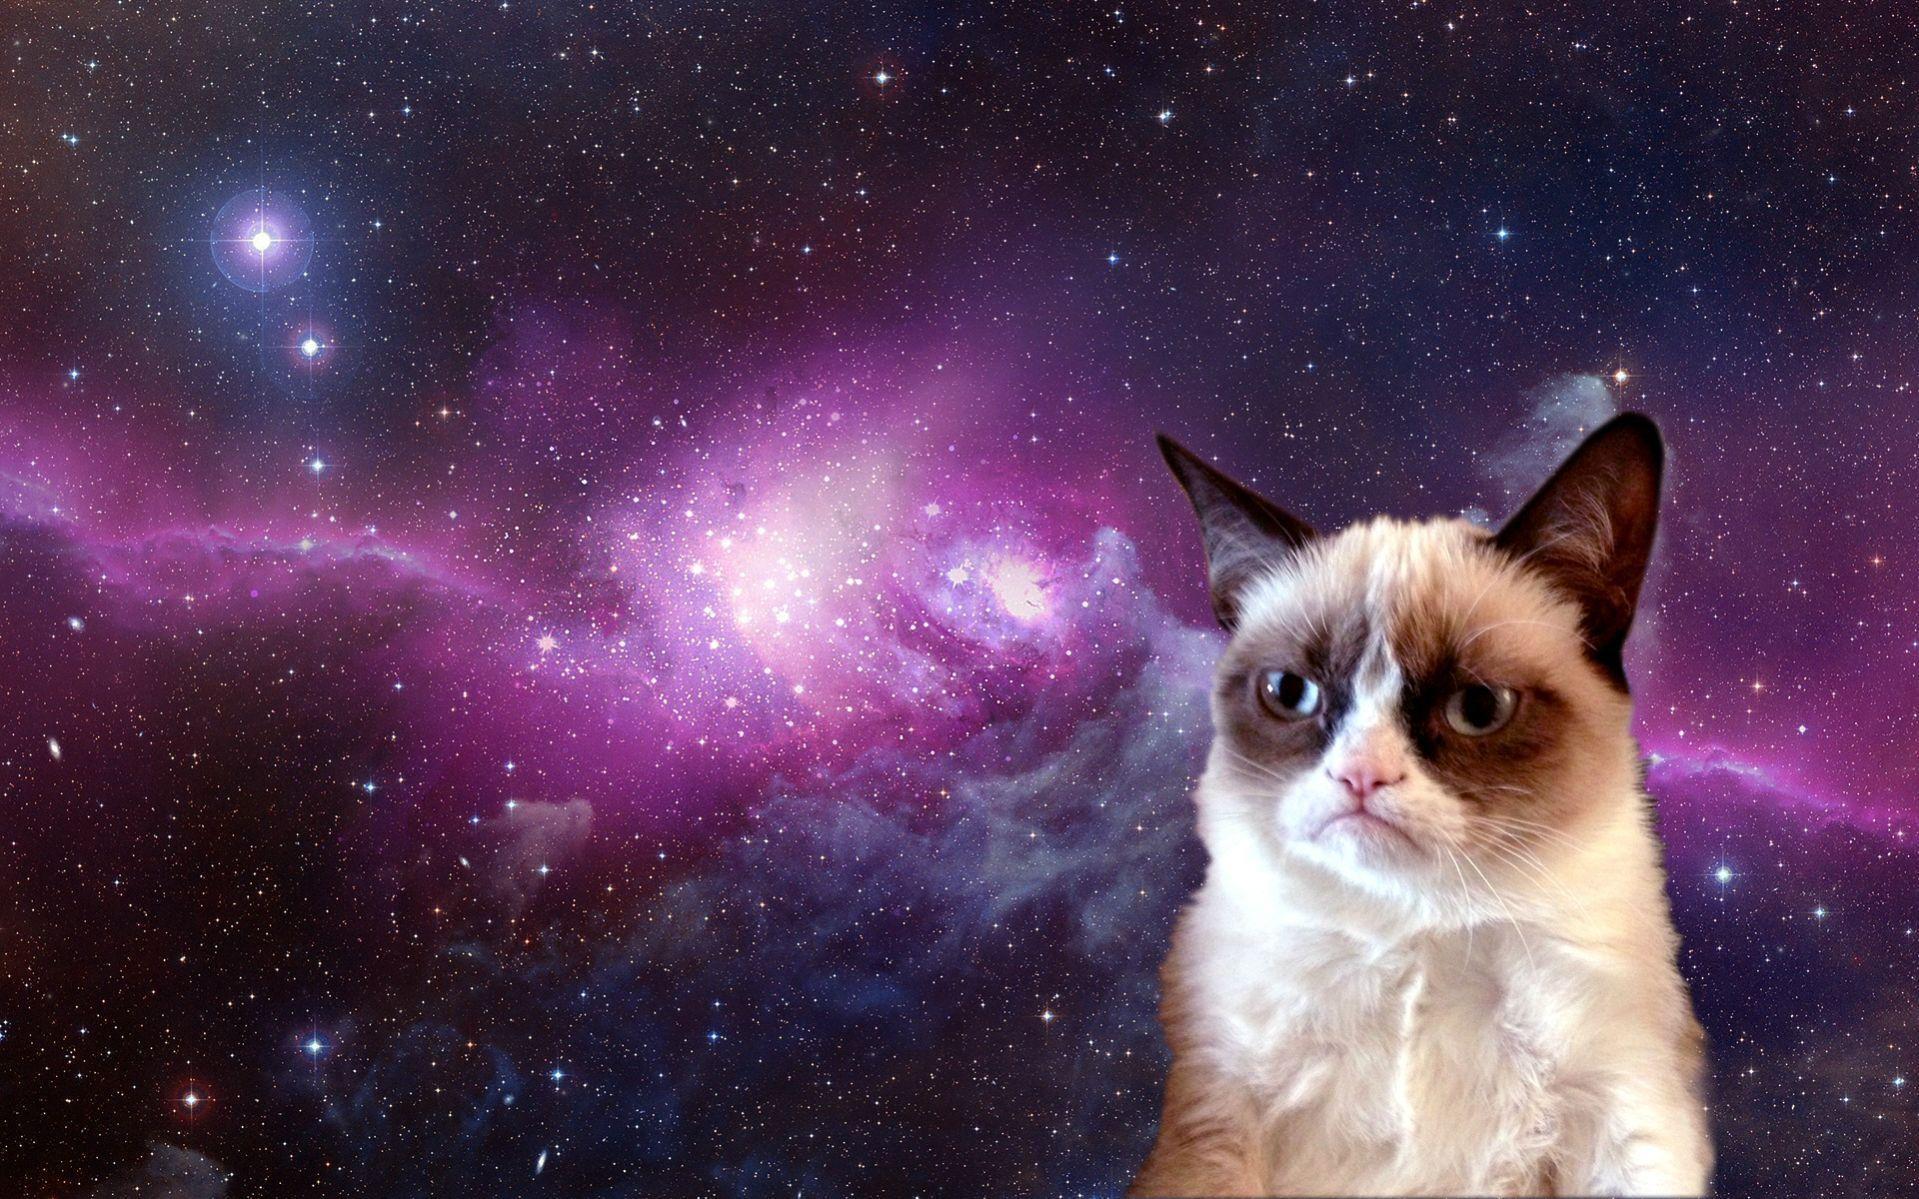 grumpy cat wallpaper nature | vergapipe.